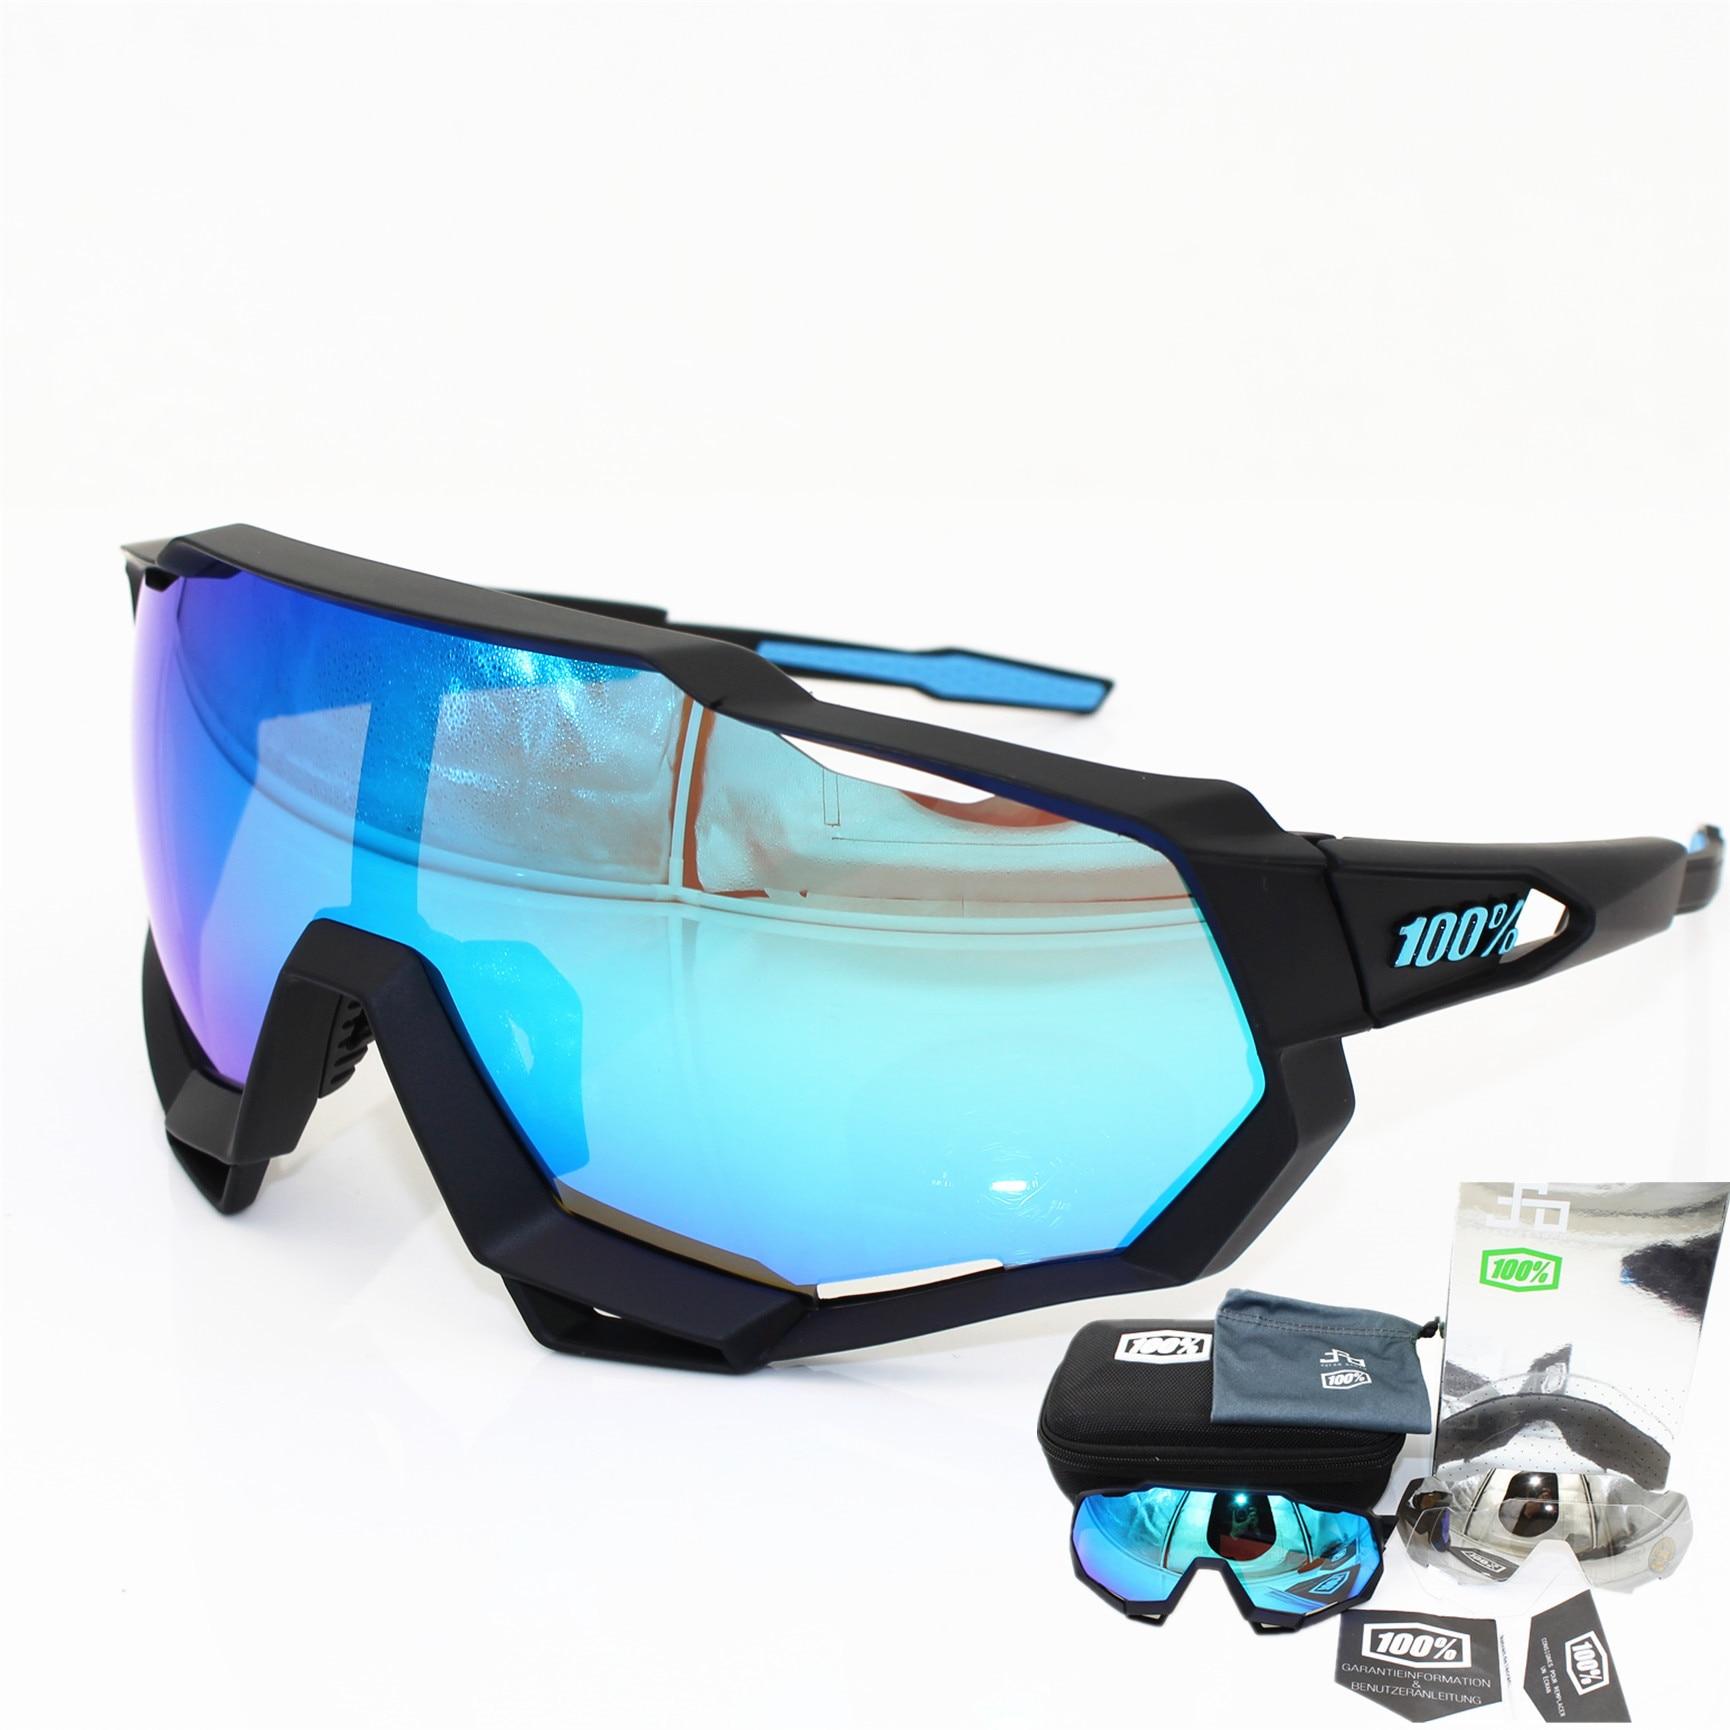 Brand Base Sports Sunglasses Gafas ciclismo Cycling Glasses Eyewear MTB Bike Bicycle Riding Finshing Goggles 2016 new fashion sunglasses women brand designer sun glasses vintage eyewear